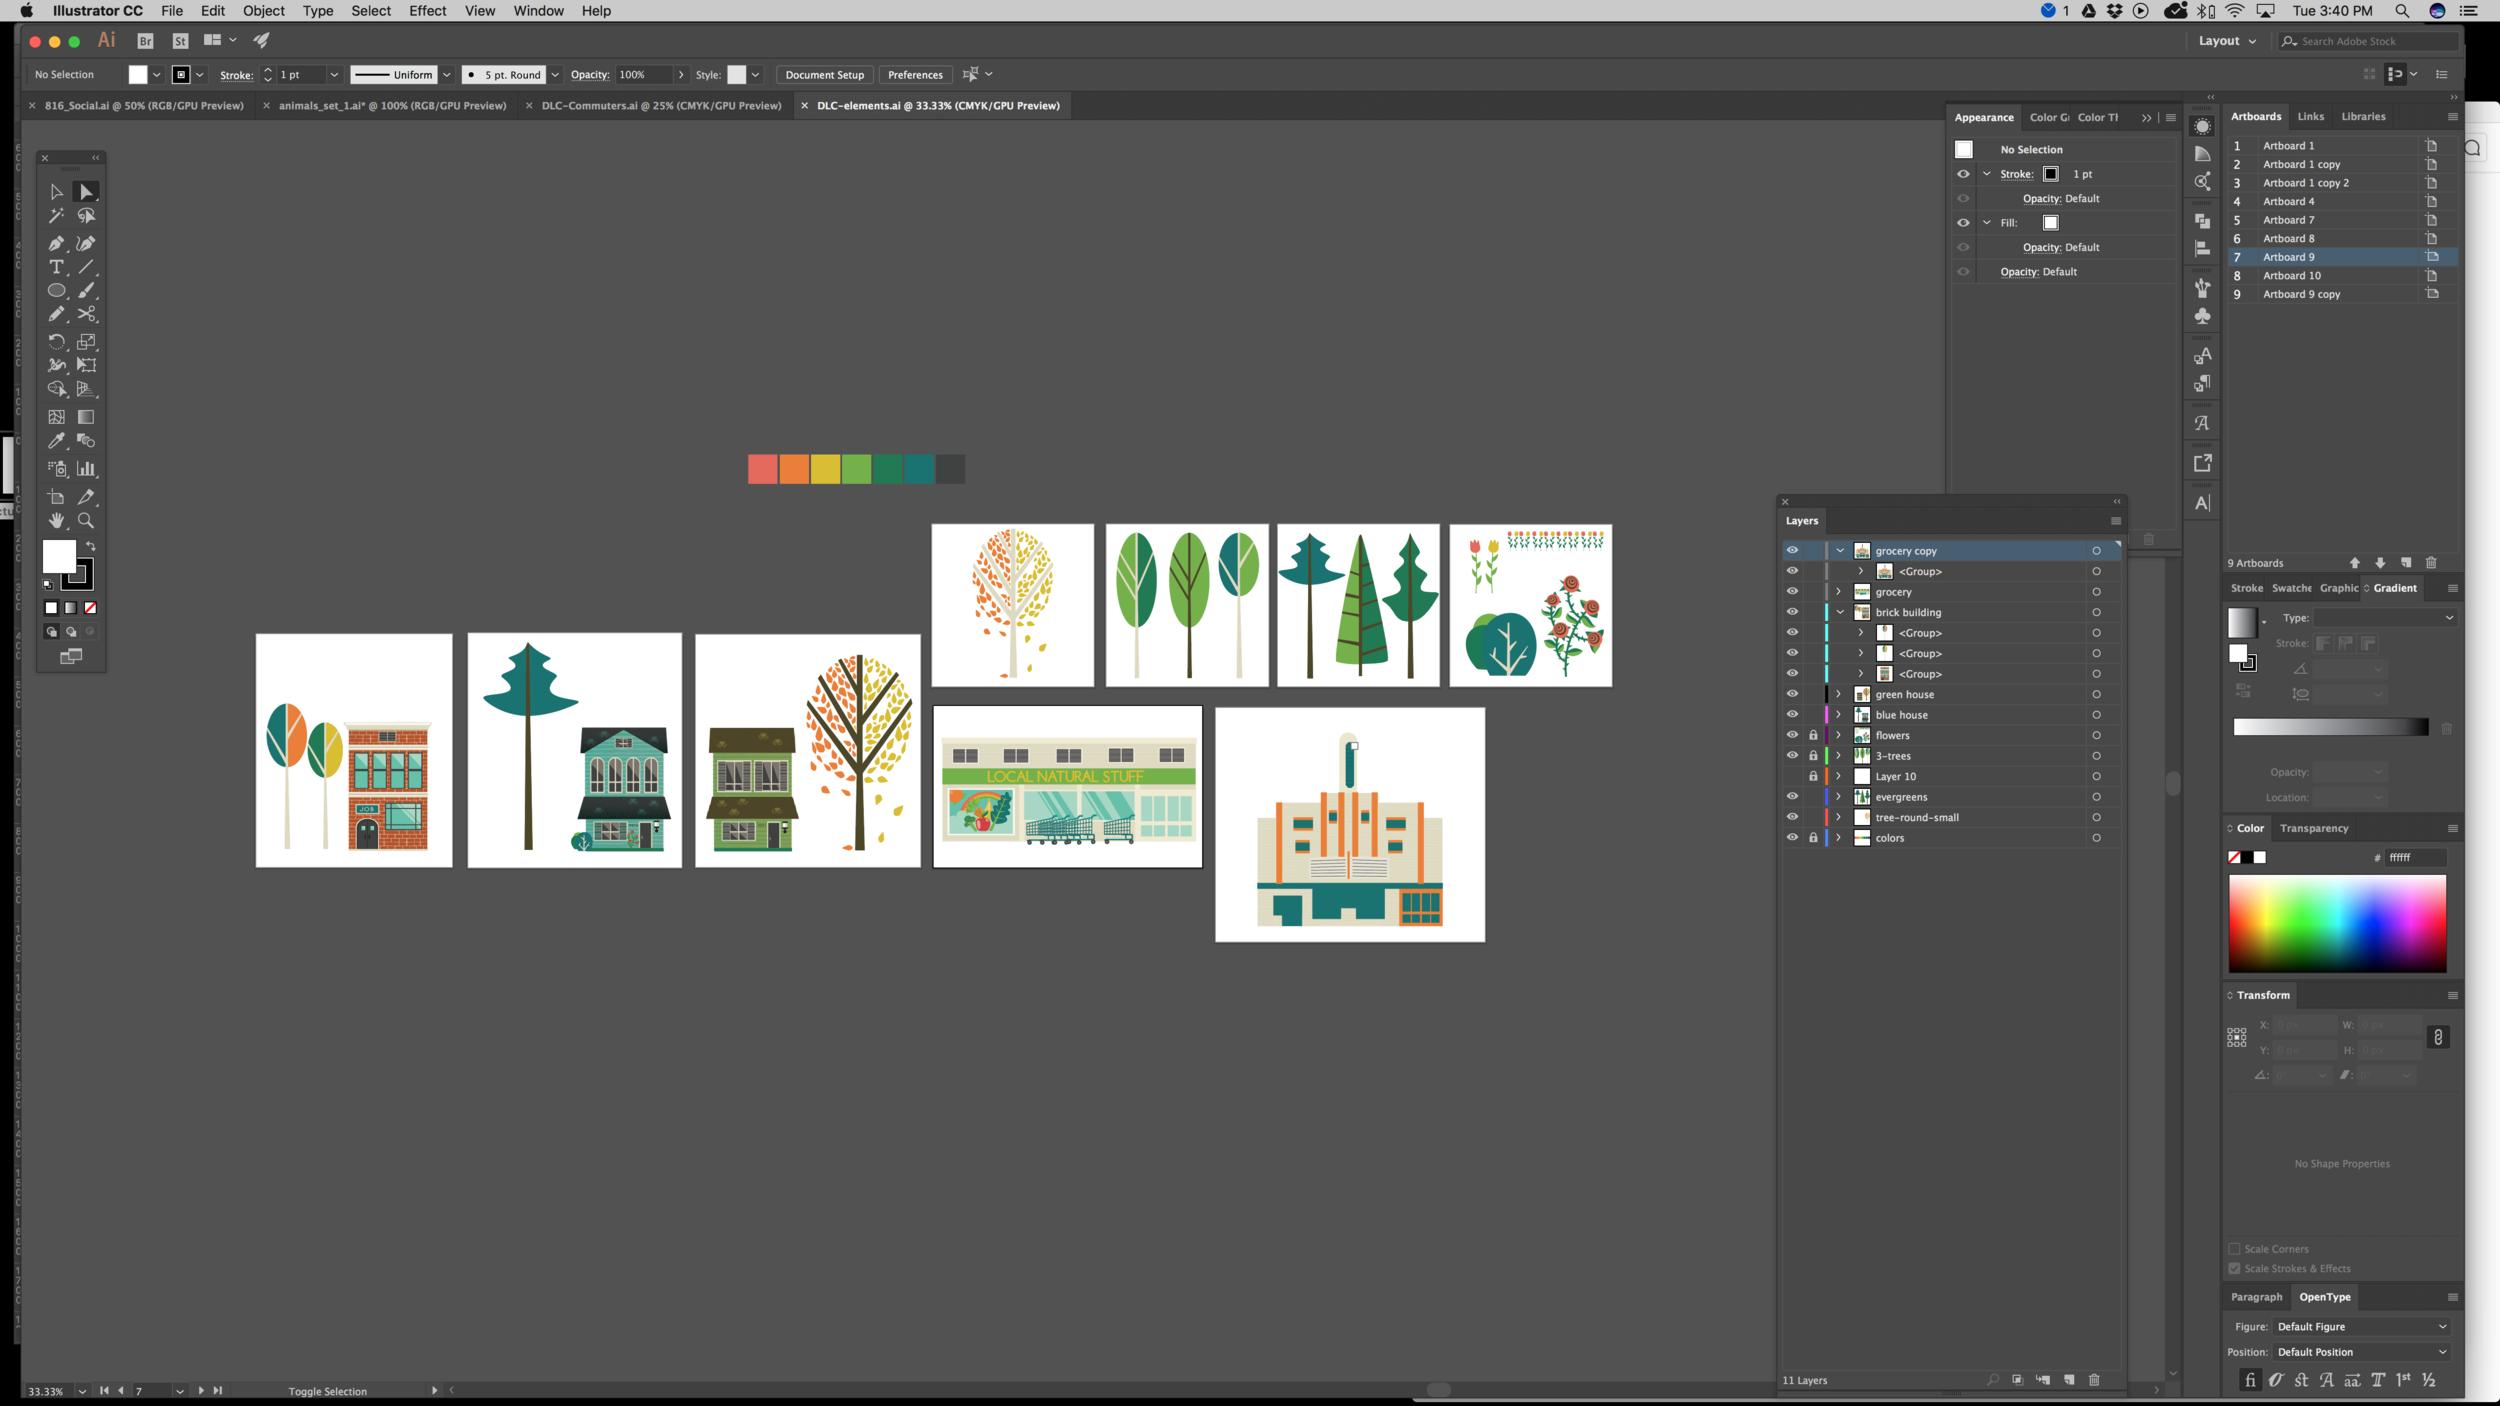 environmental background elements in progress